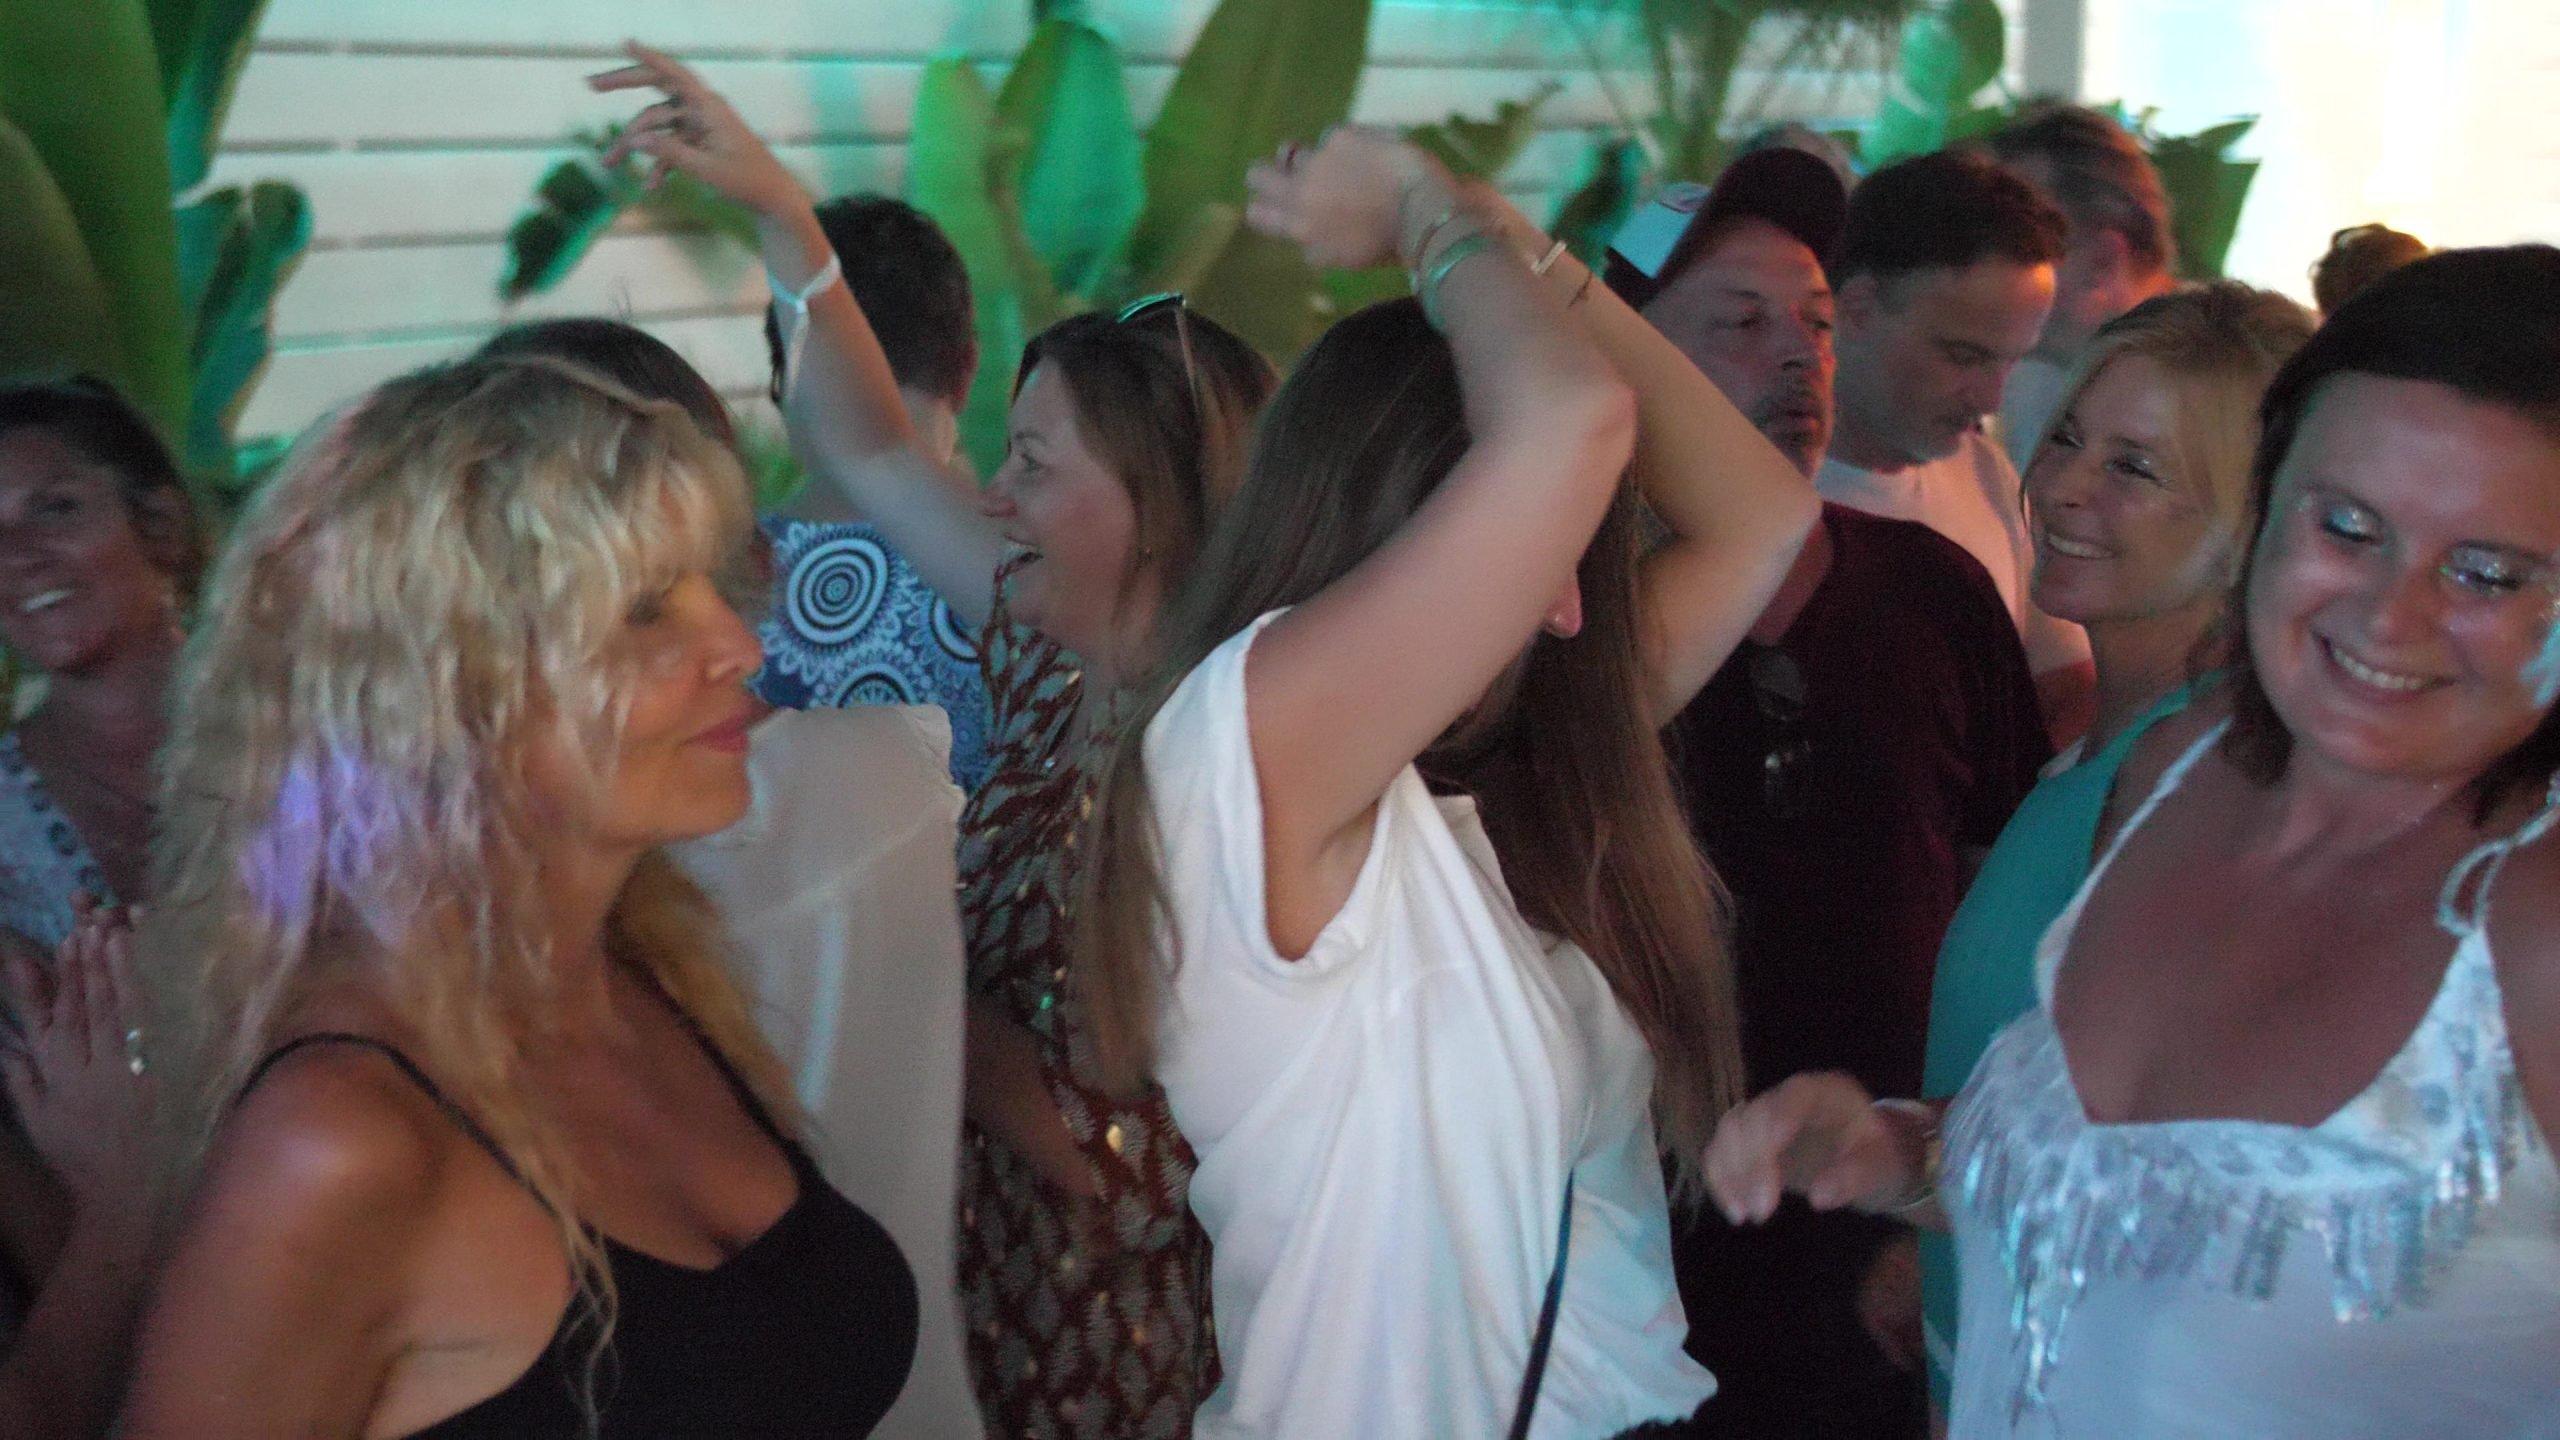 creteliafestival_stills45